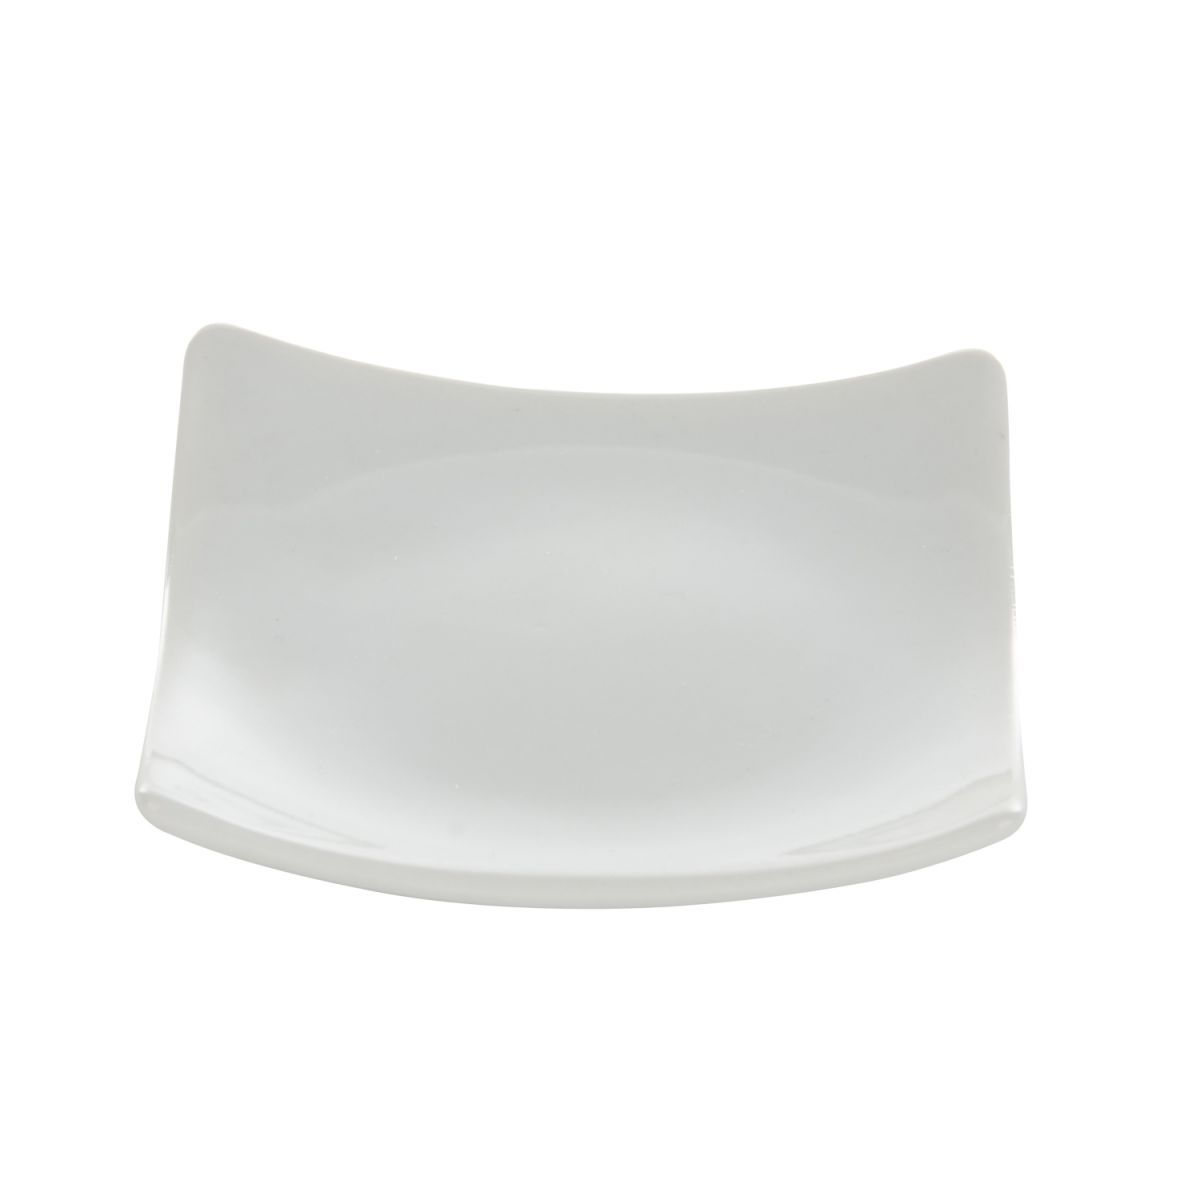 bord porselein vierkant wit 16 x 16 cmbox 6